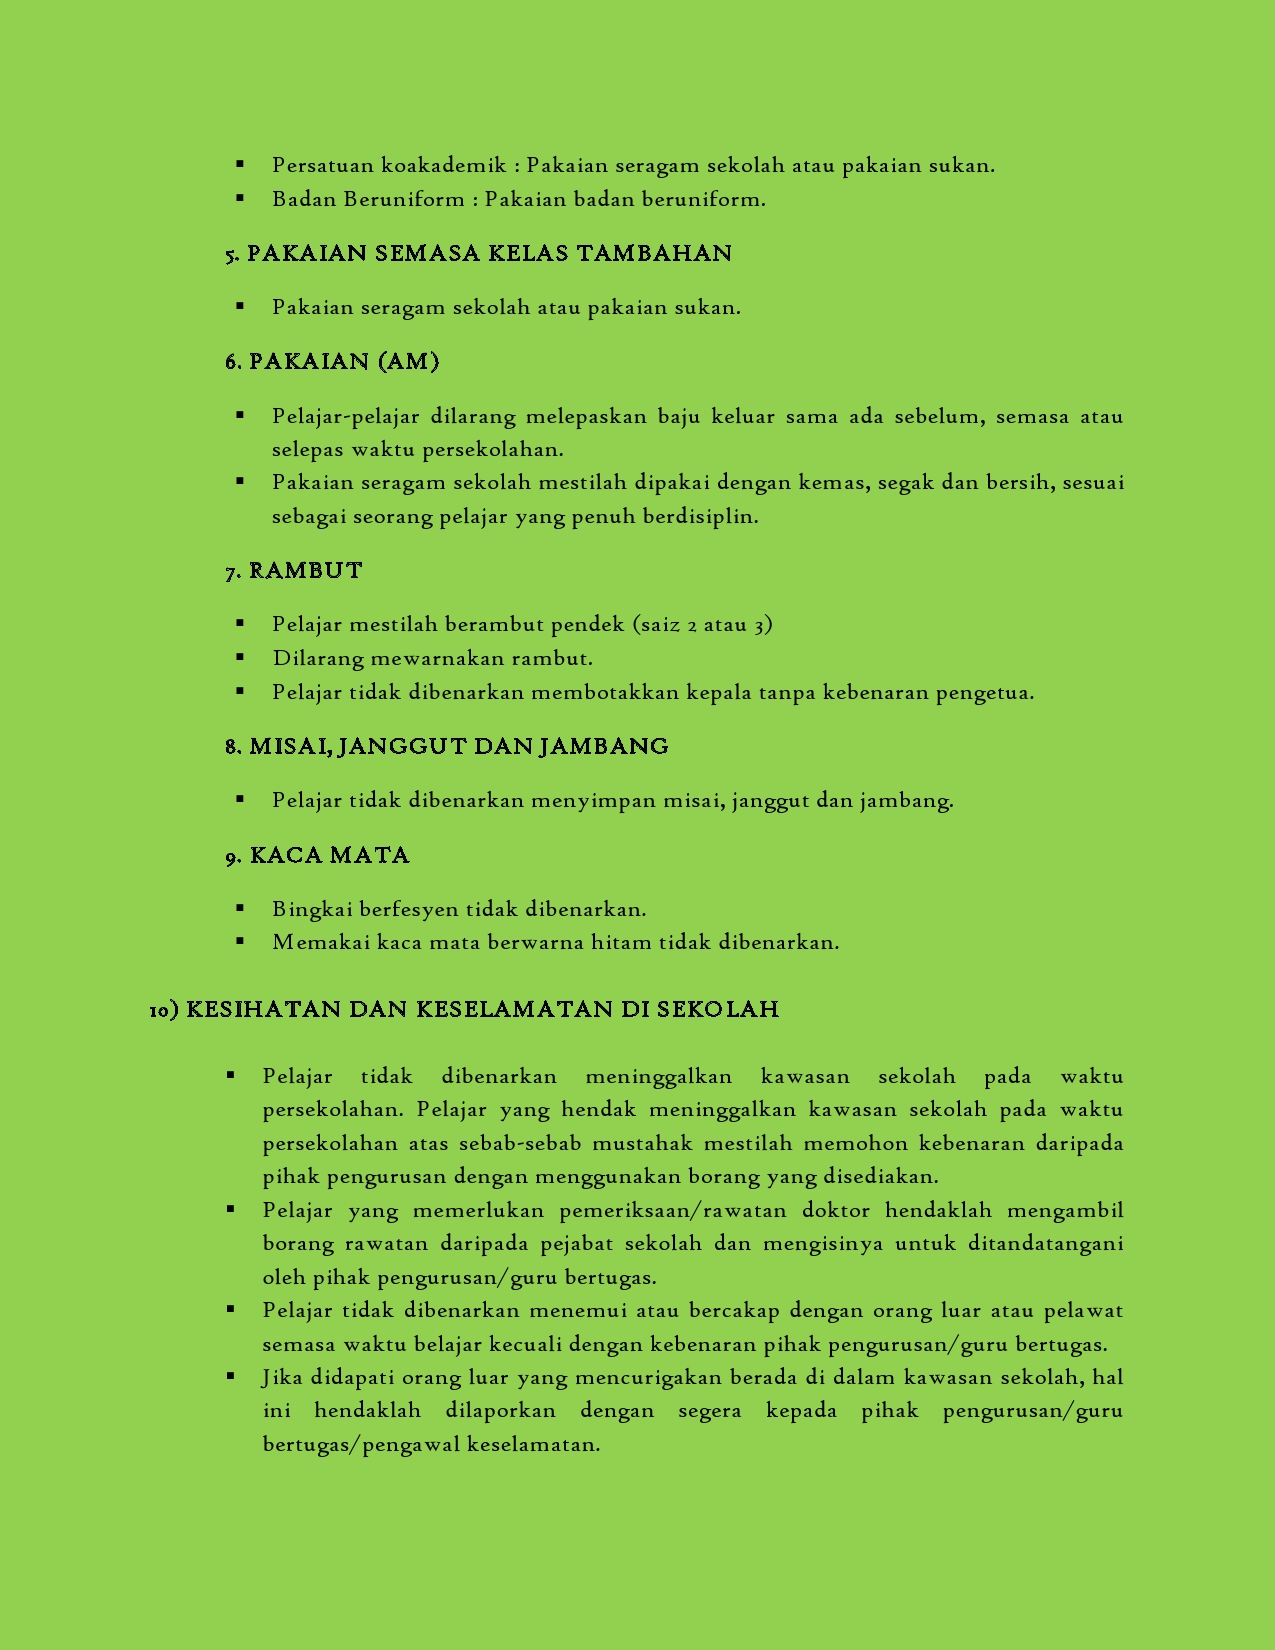 PROSPEKTUS SEKOLAH-page0009